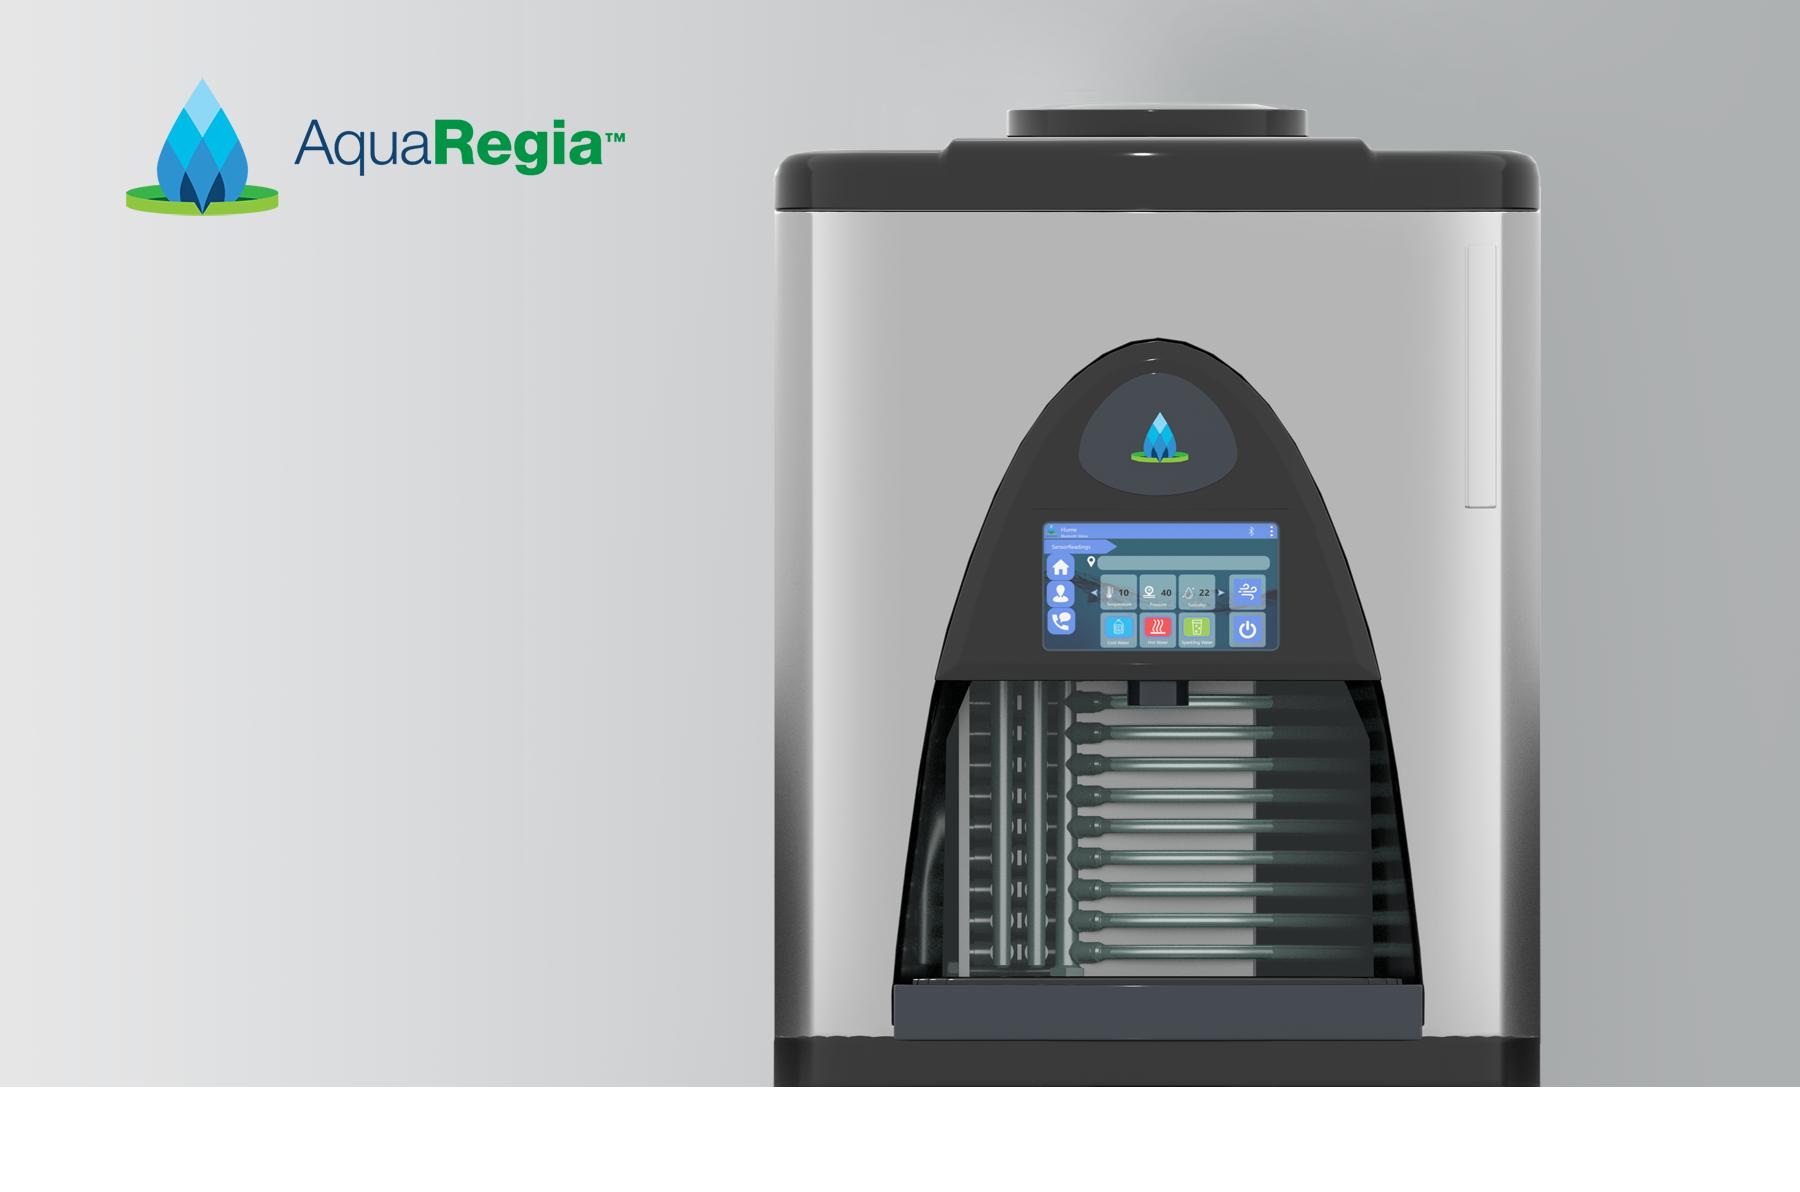 AquaRegia Unit slide 6.5.png